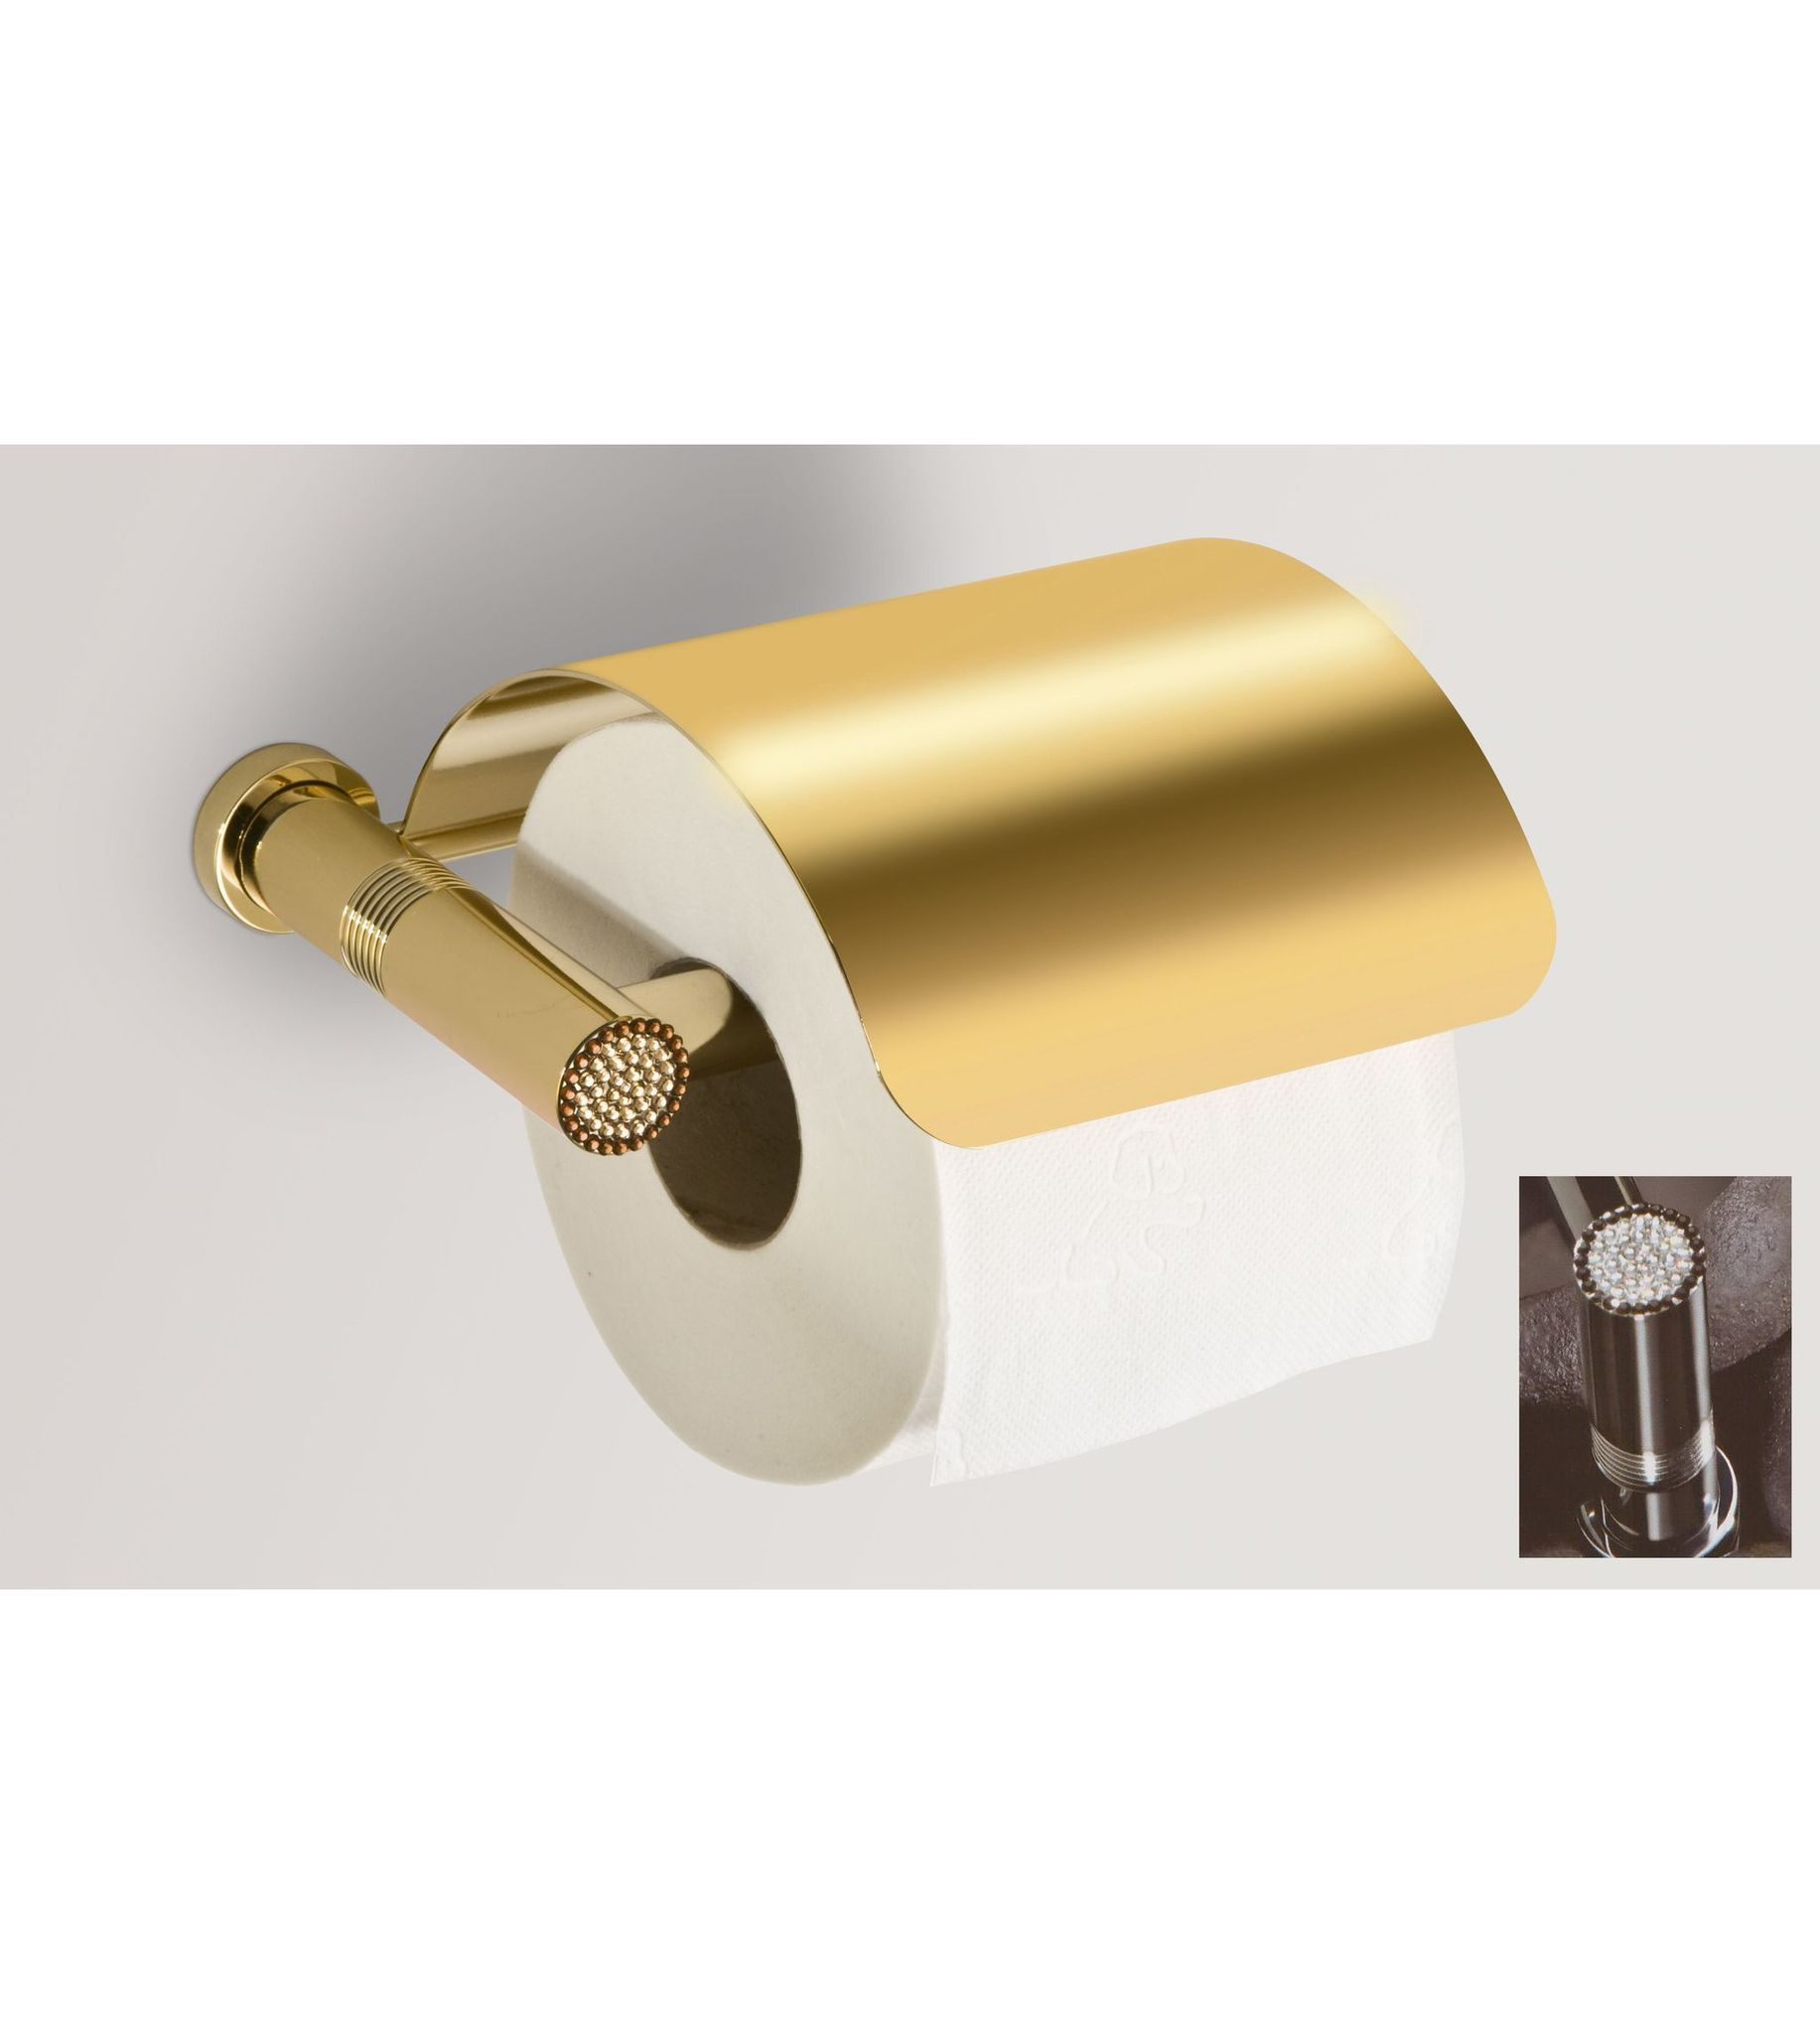 Держатели для ванной Держатель туалетной бумаги c крышкой Windisch 85551CR Starlight derzhatel-tualetnoy-bumagi-c-kryshkoy-85551cr-starlight-ot-windisch-ispaniya.jpg